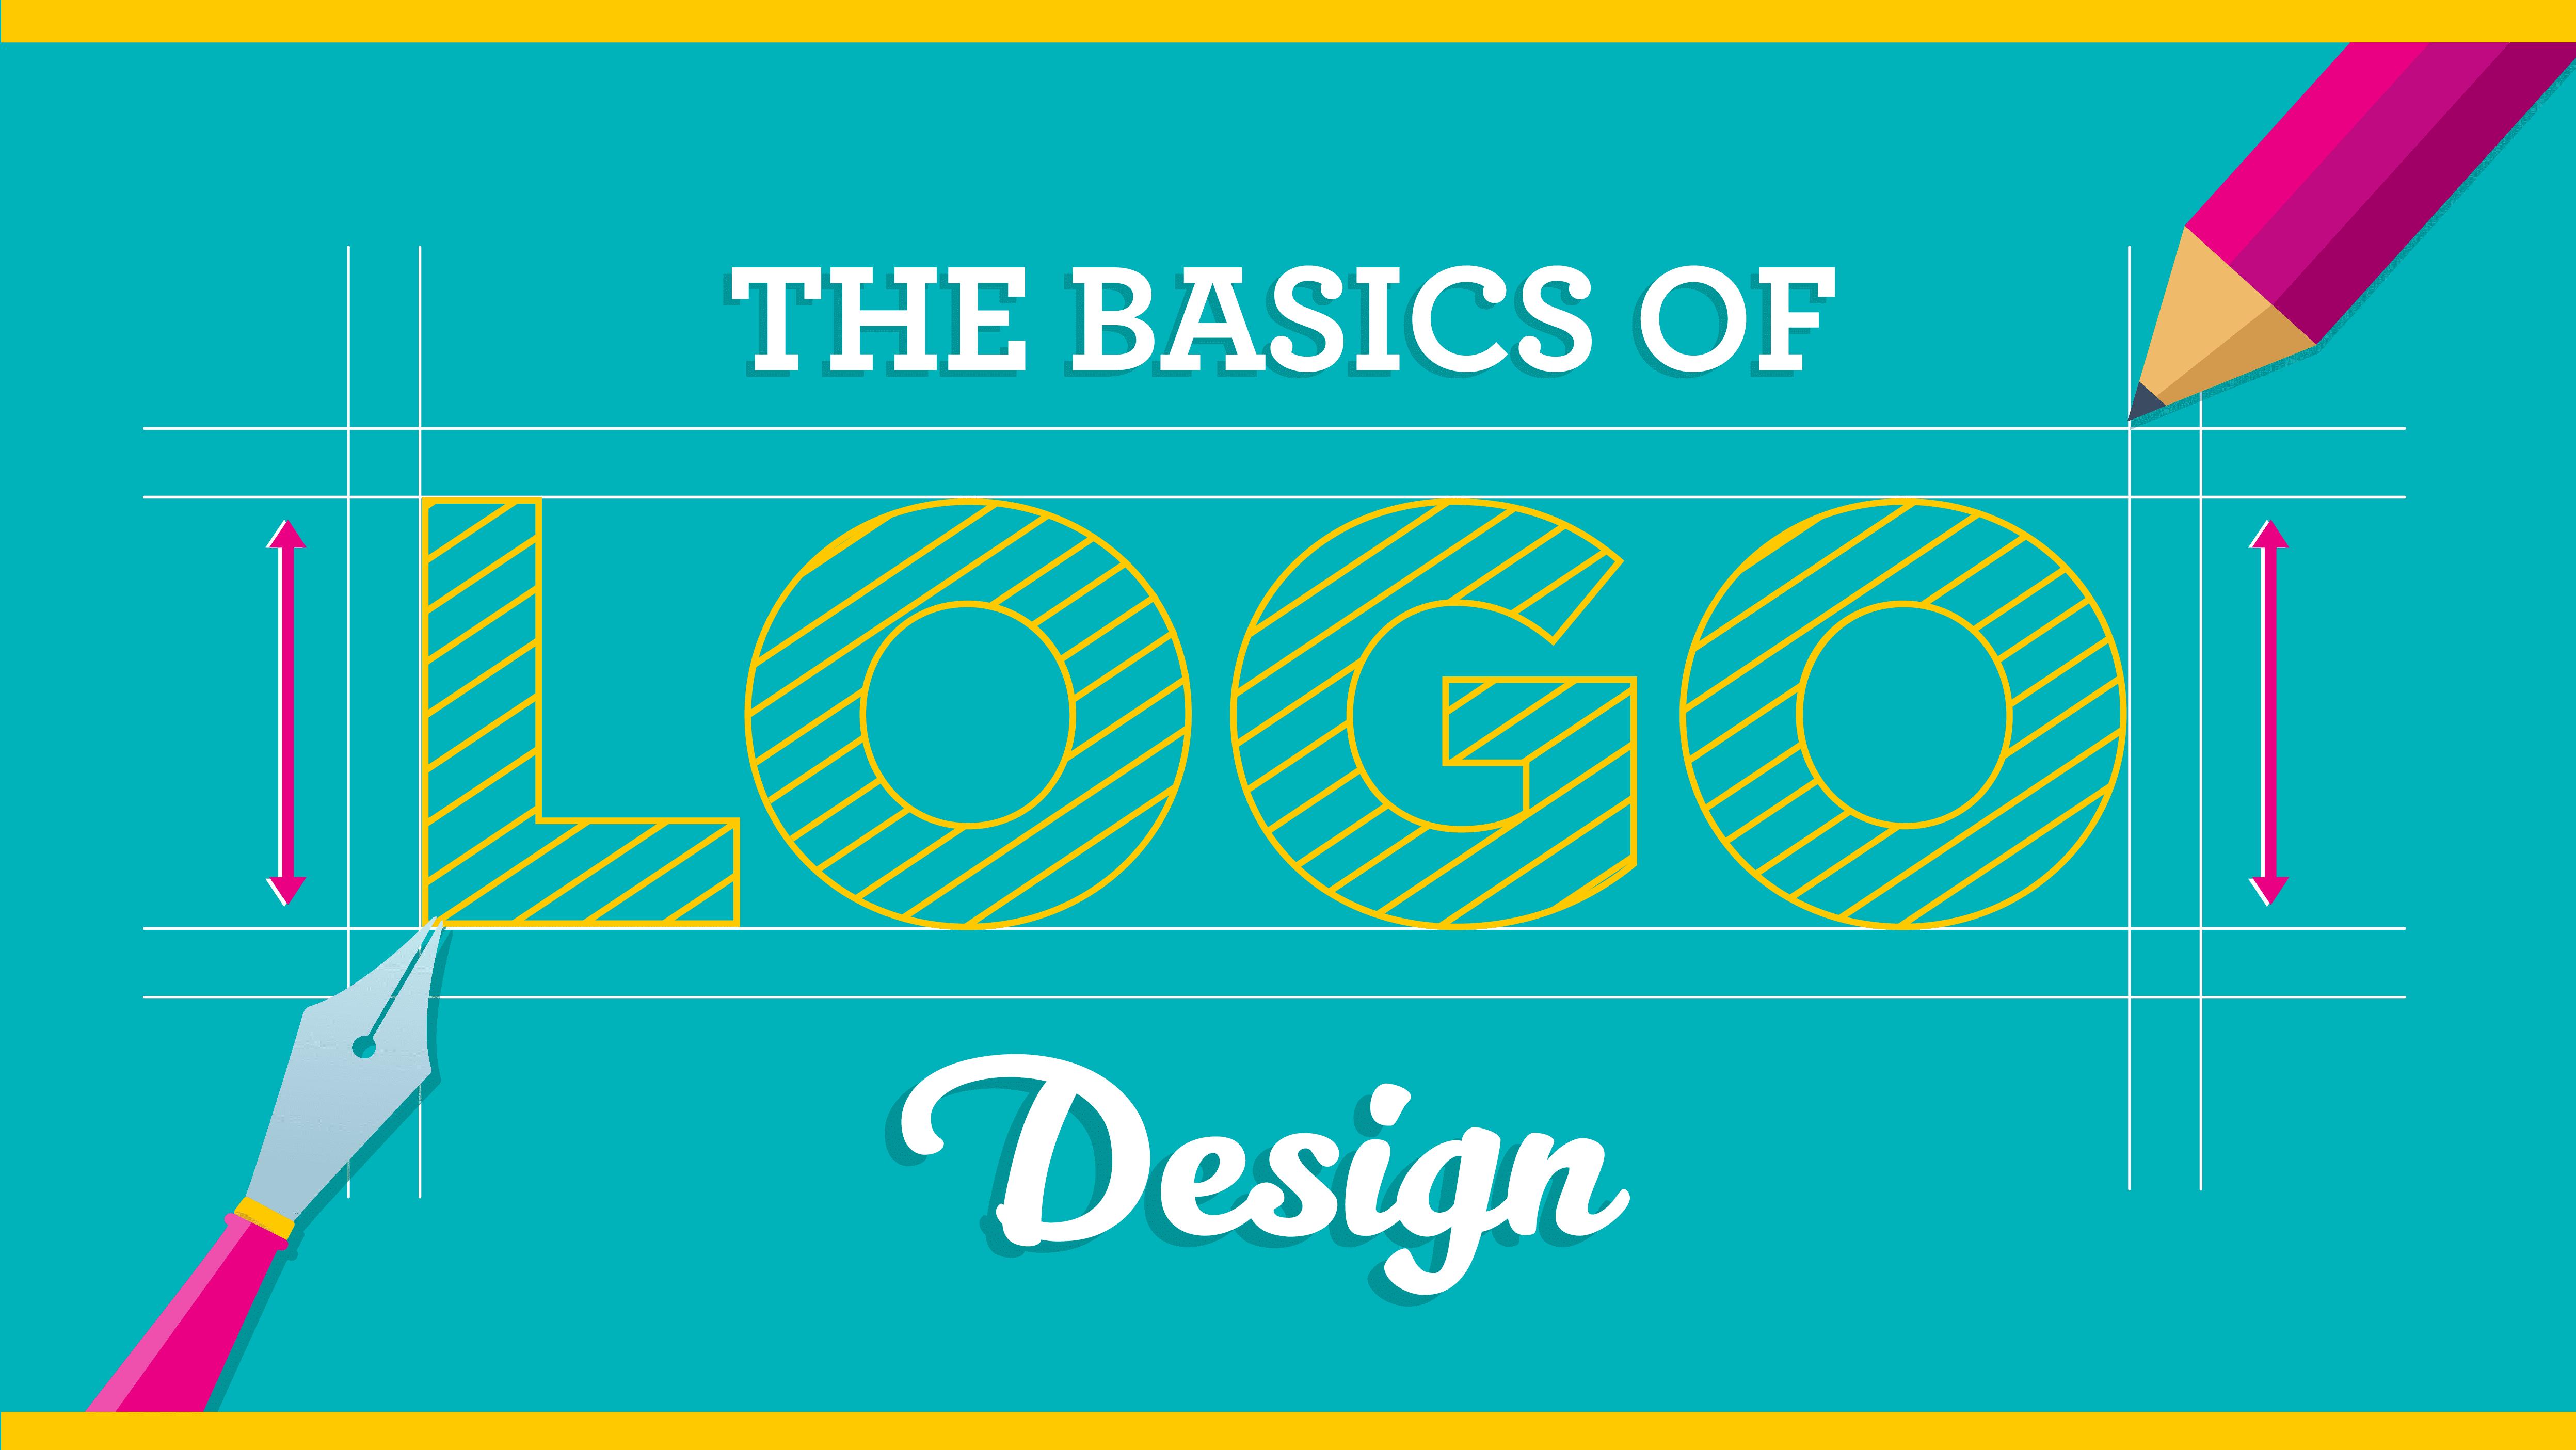 digital-marketing-agency-logo-design-basics-how-to-create-a-logo